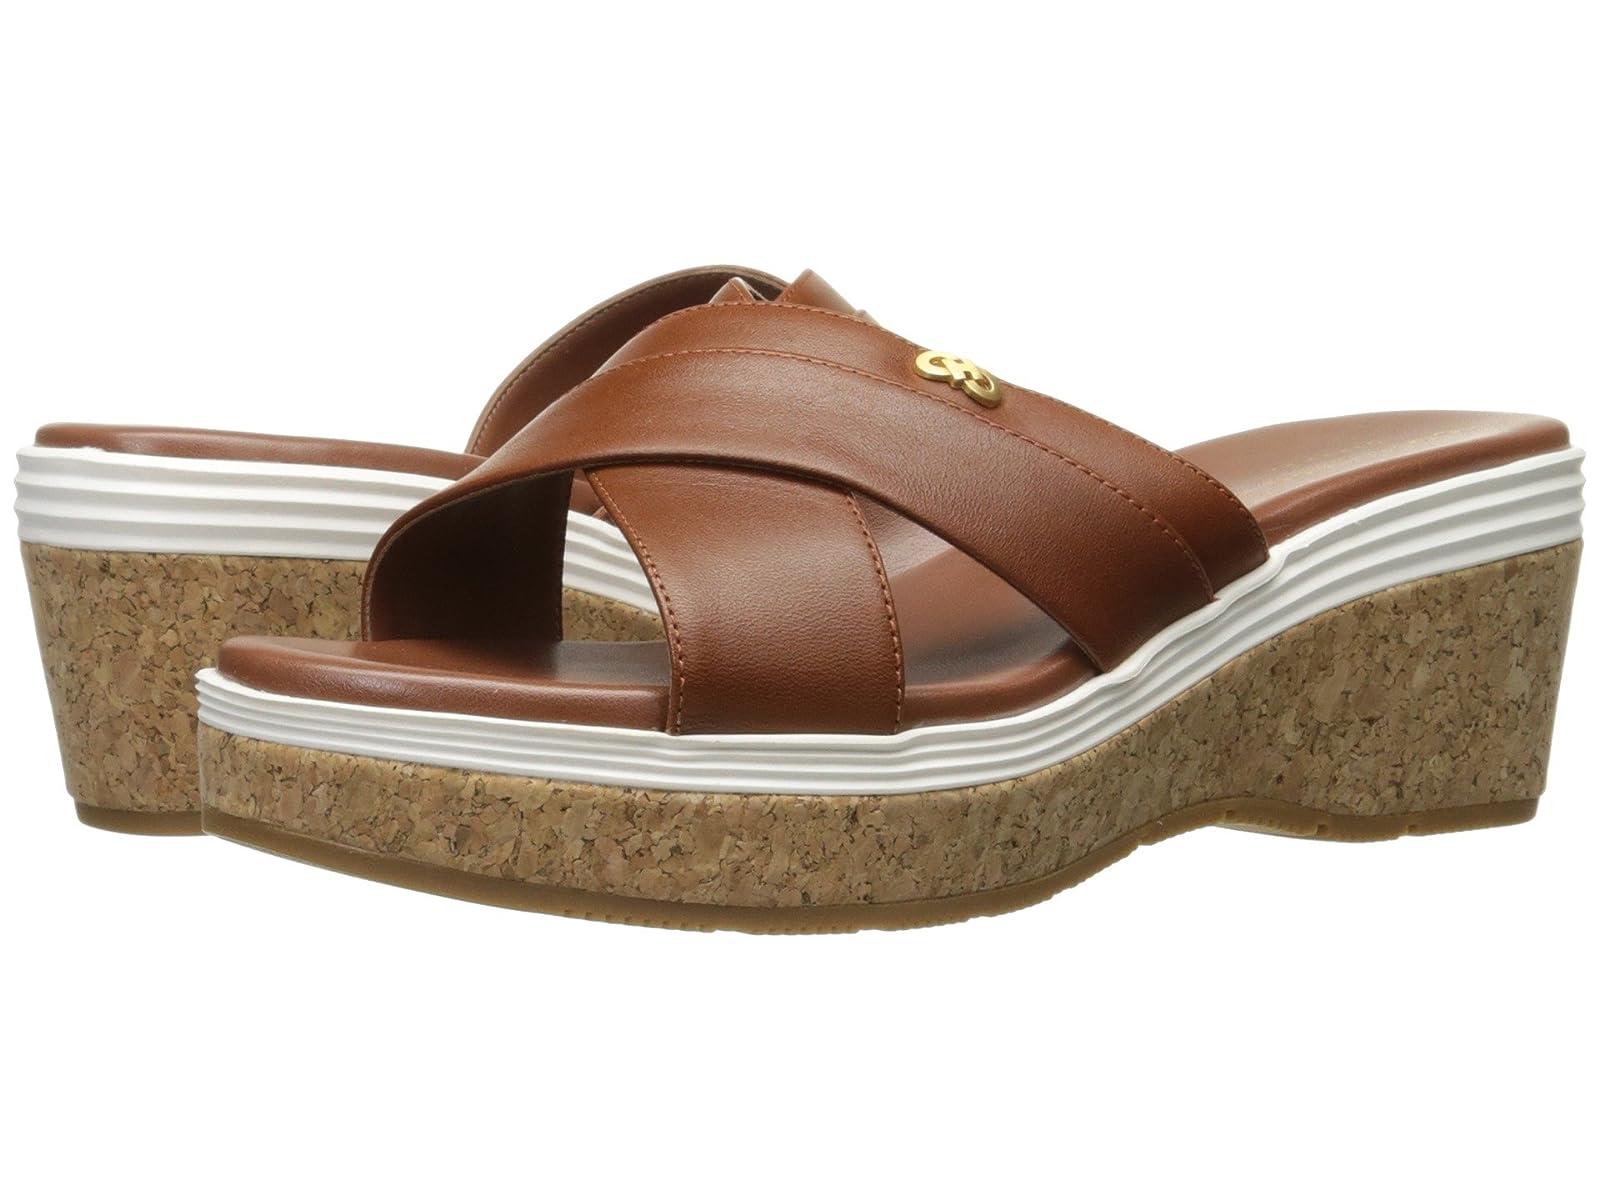 Cole Haan Briella Grand Sandal IICheap and distinctive eye-catching shoes